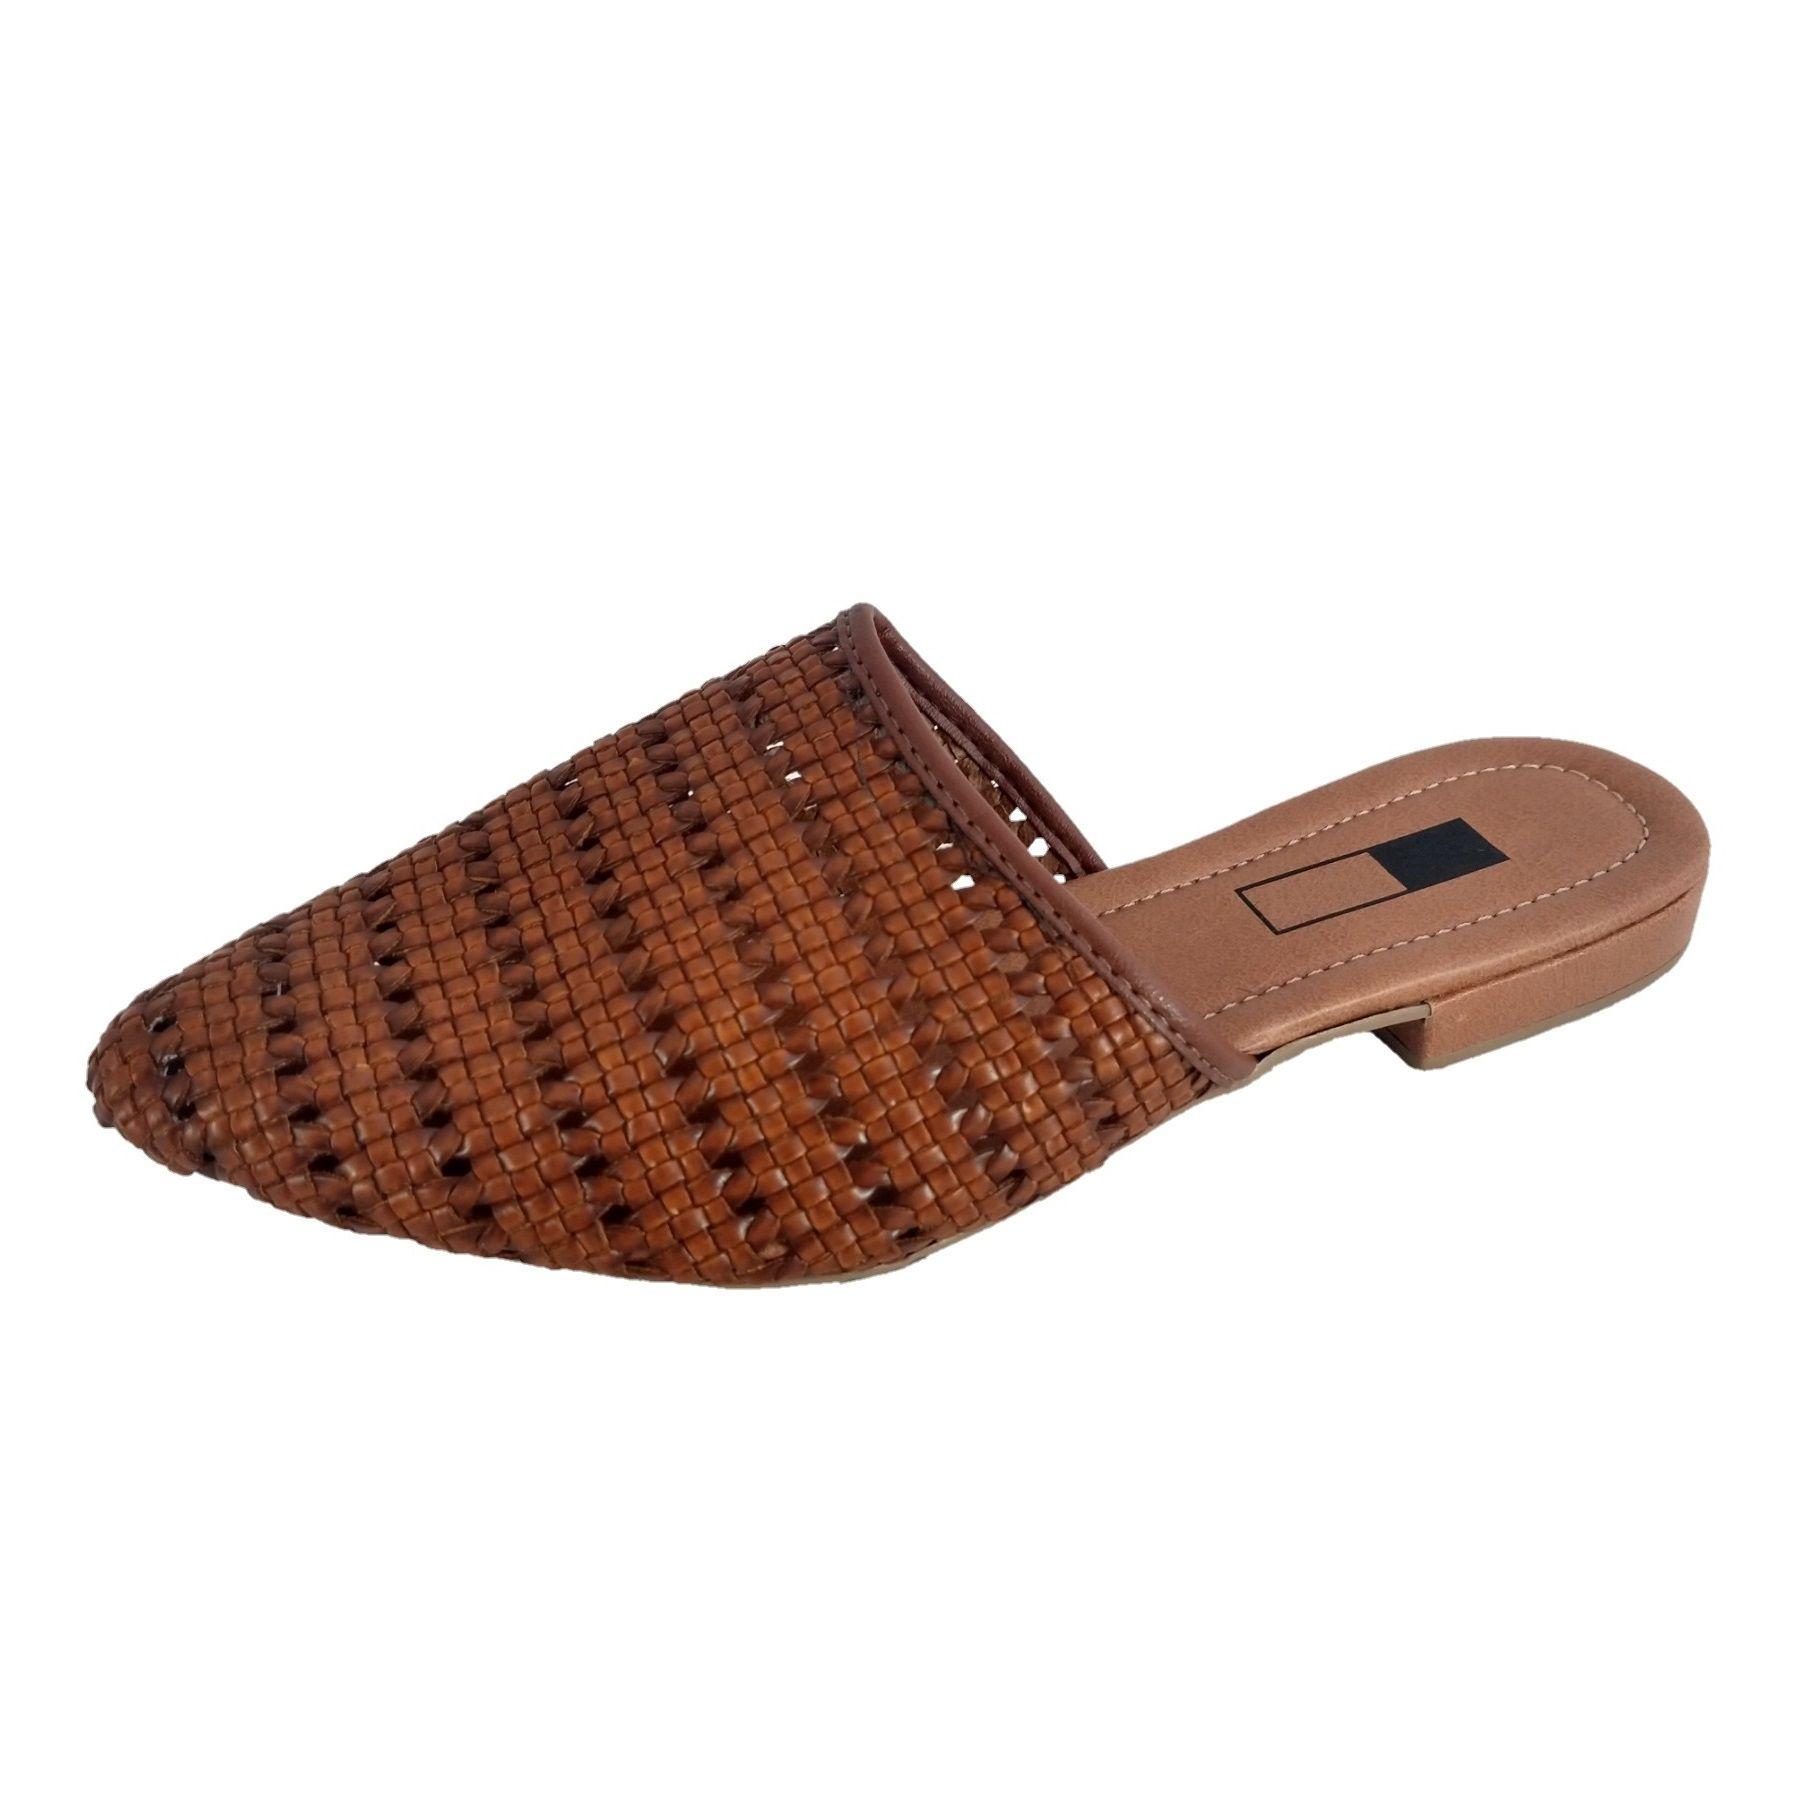 Mule Slipper SapatoWeb Tranças Marrom  - SAPATOWEB.COM